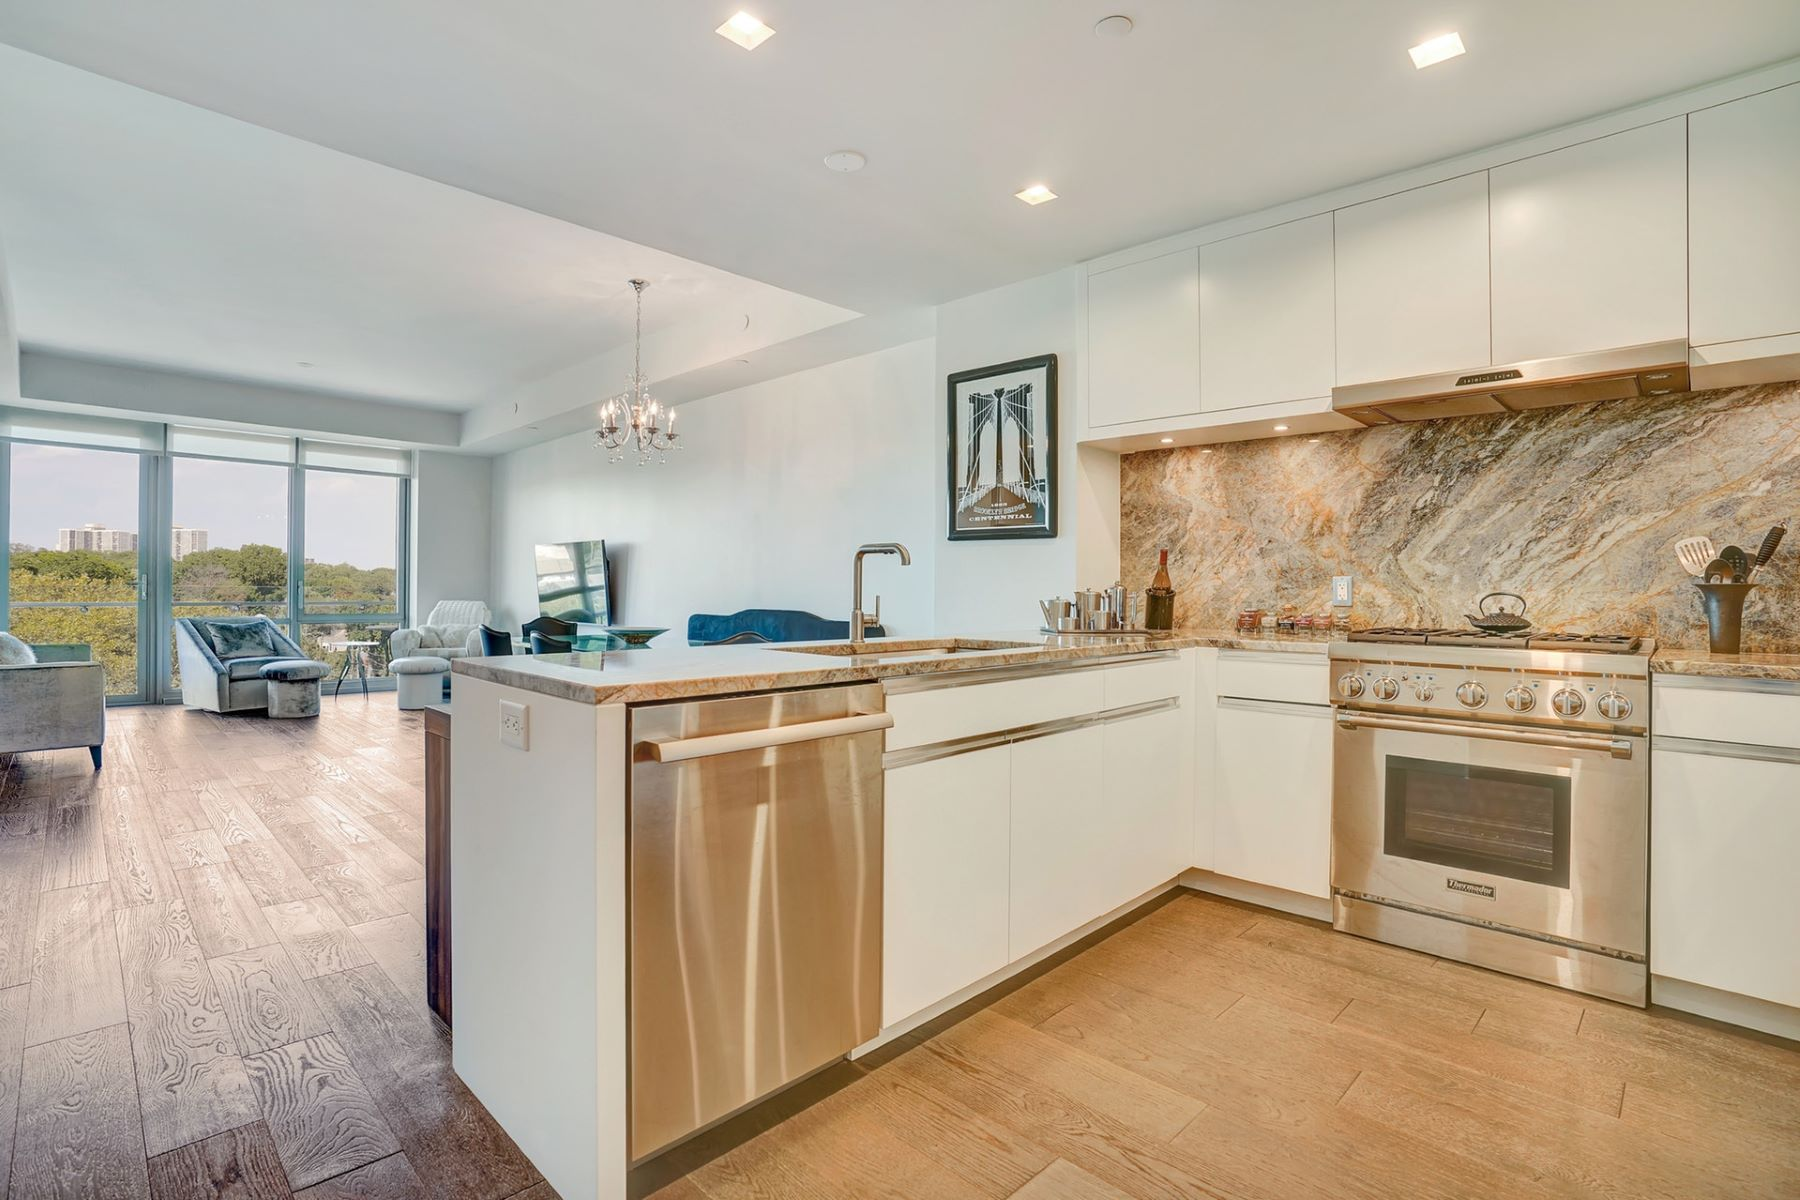 Condominiums 용 매매 에 One Park 320 Adolphus Ave #702, Cliffside Park, 뉴저지 07010 미국